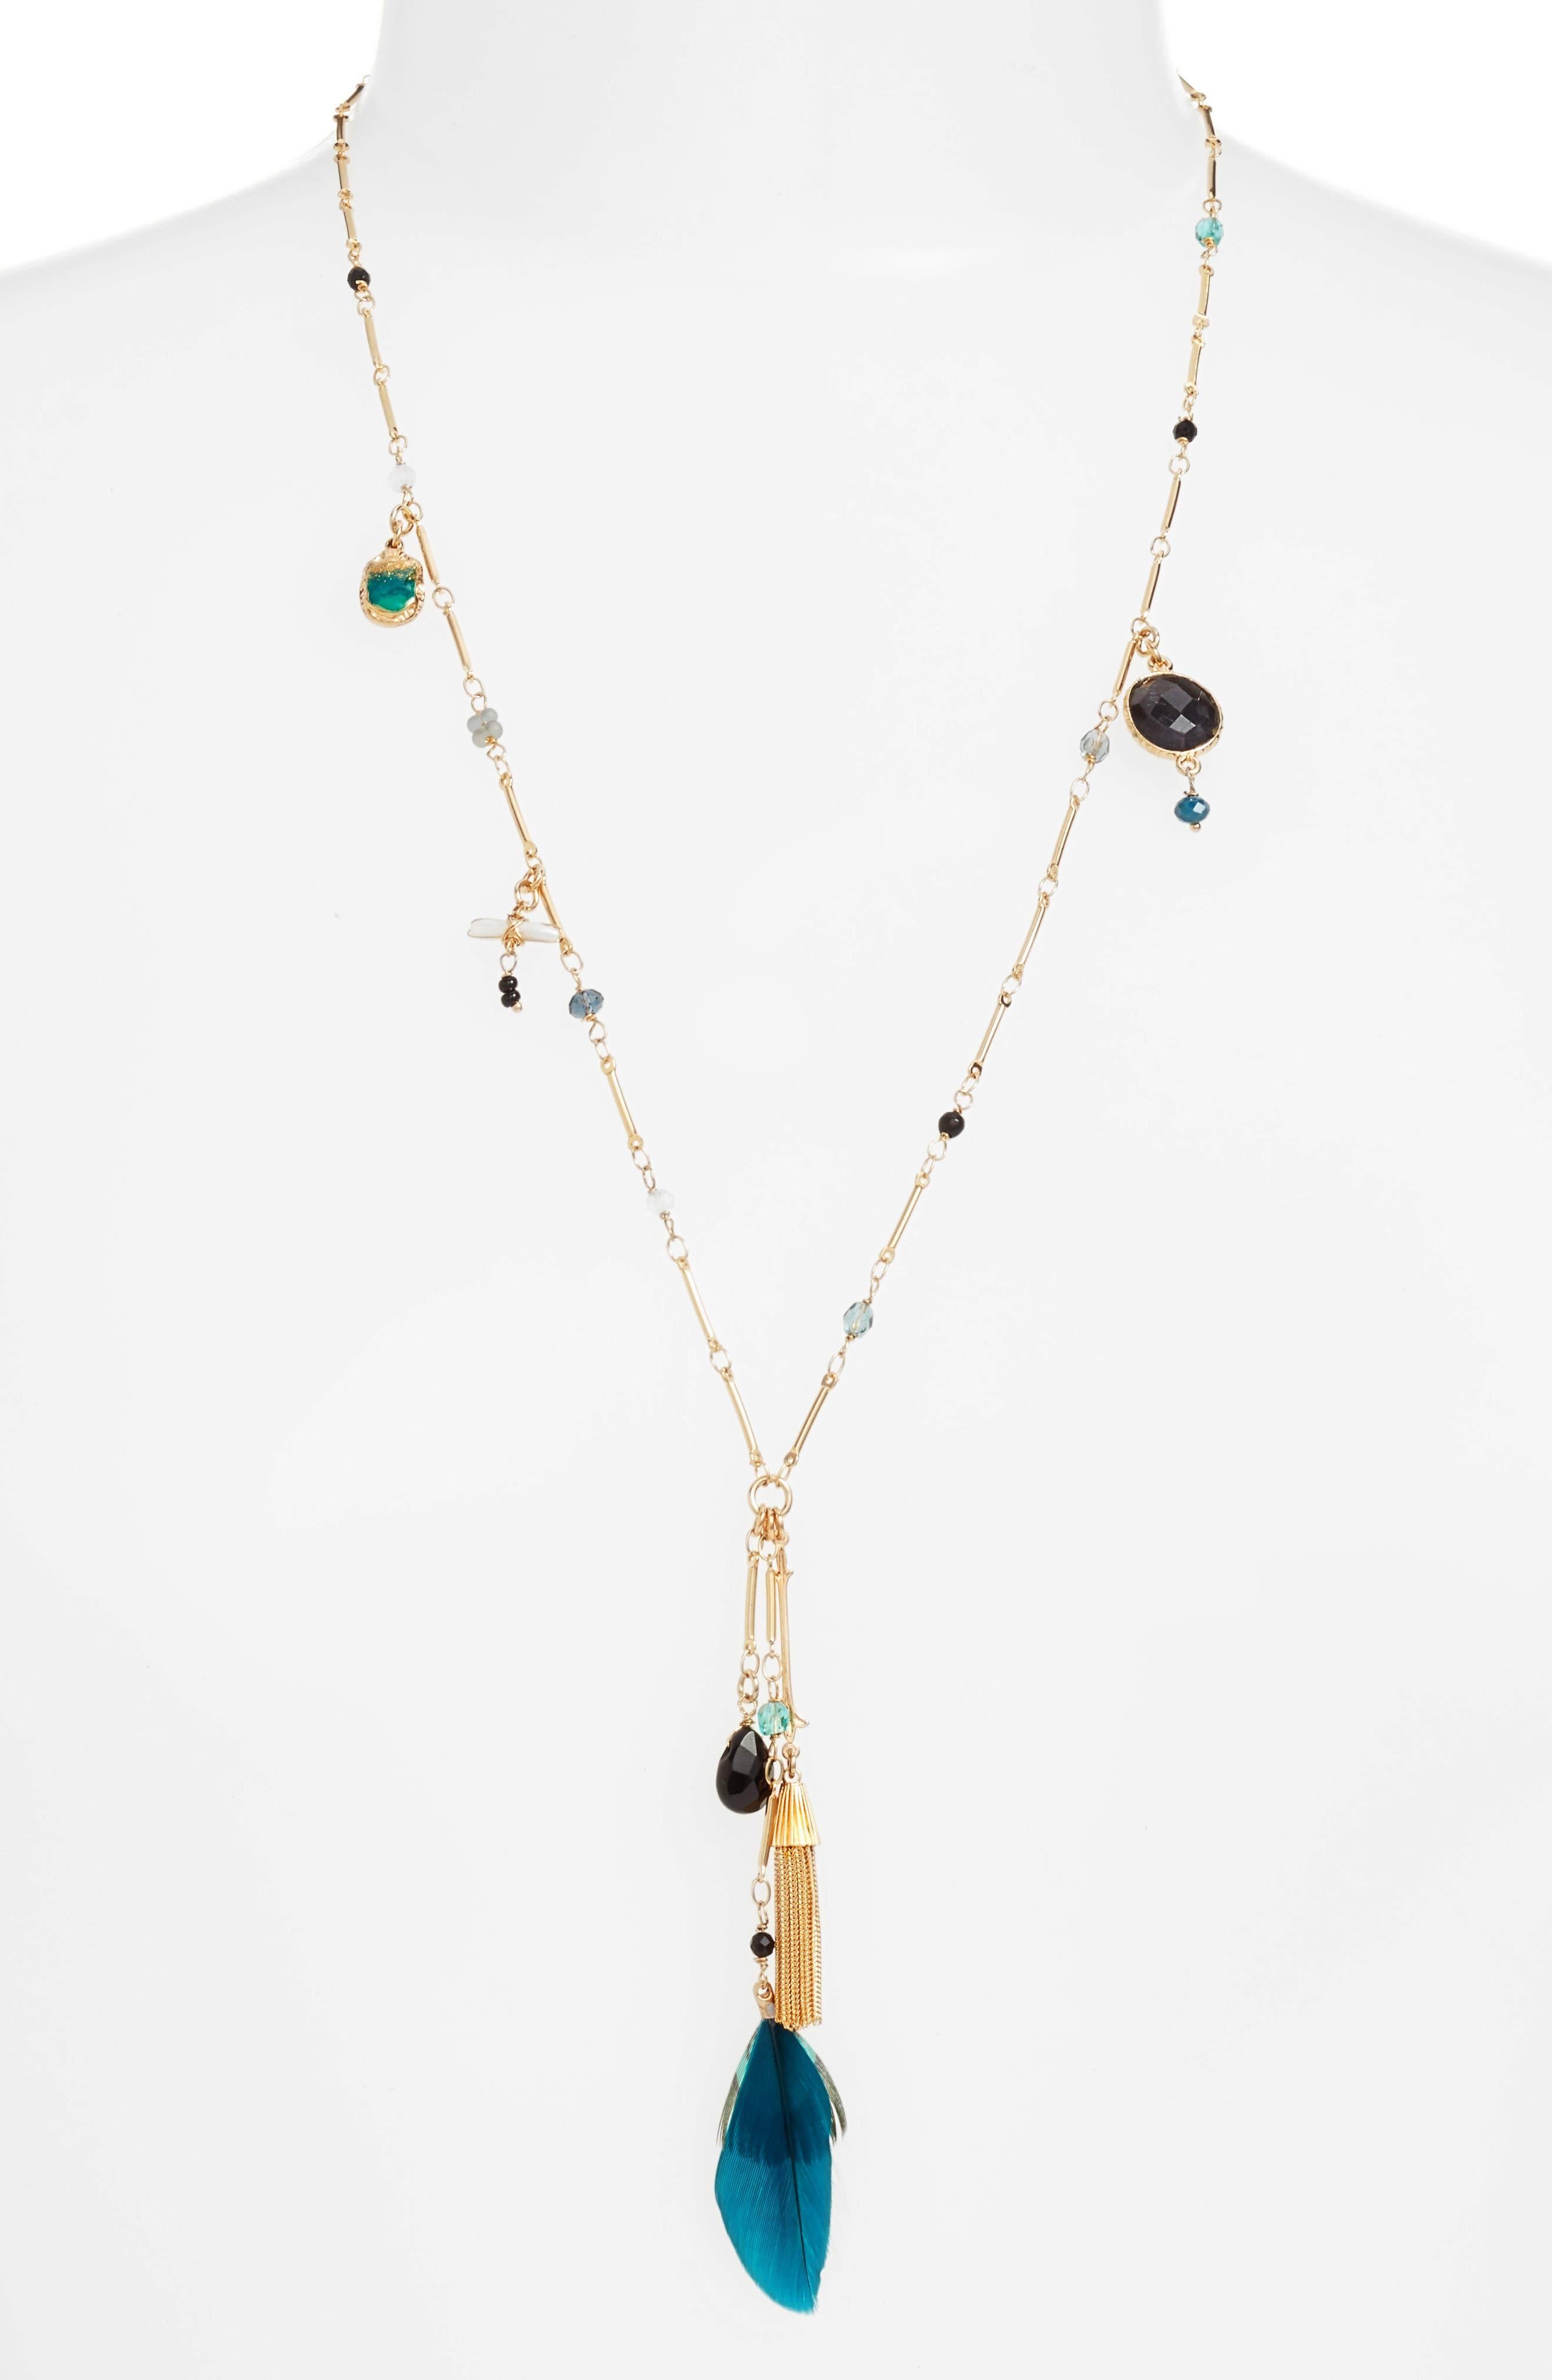 California Pendant Necklace,                             Main thumbnail 1, color,                             Blue Teal/ Gold